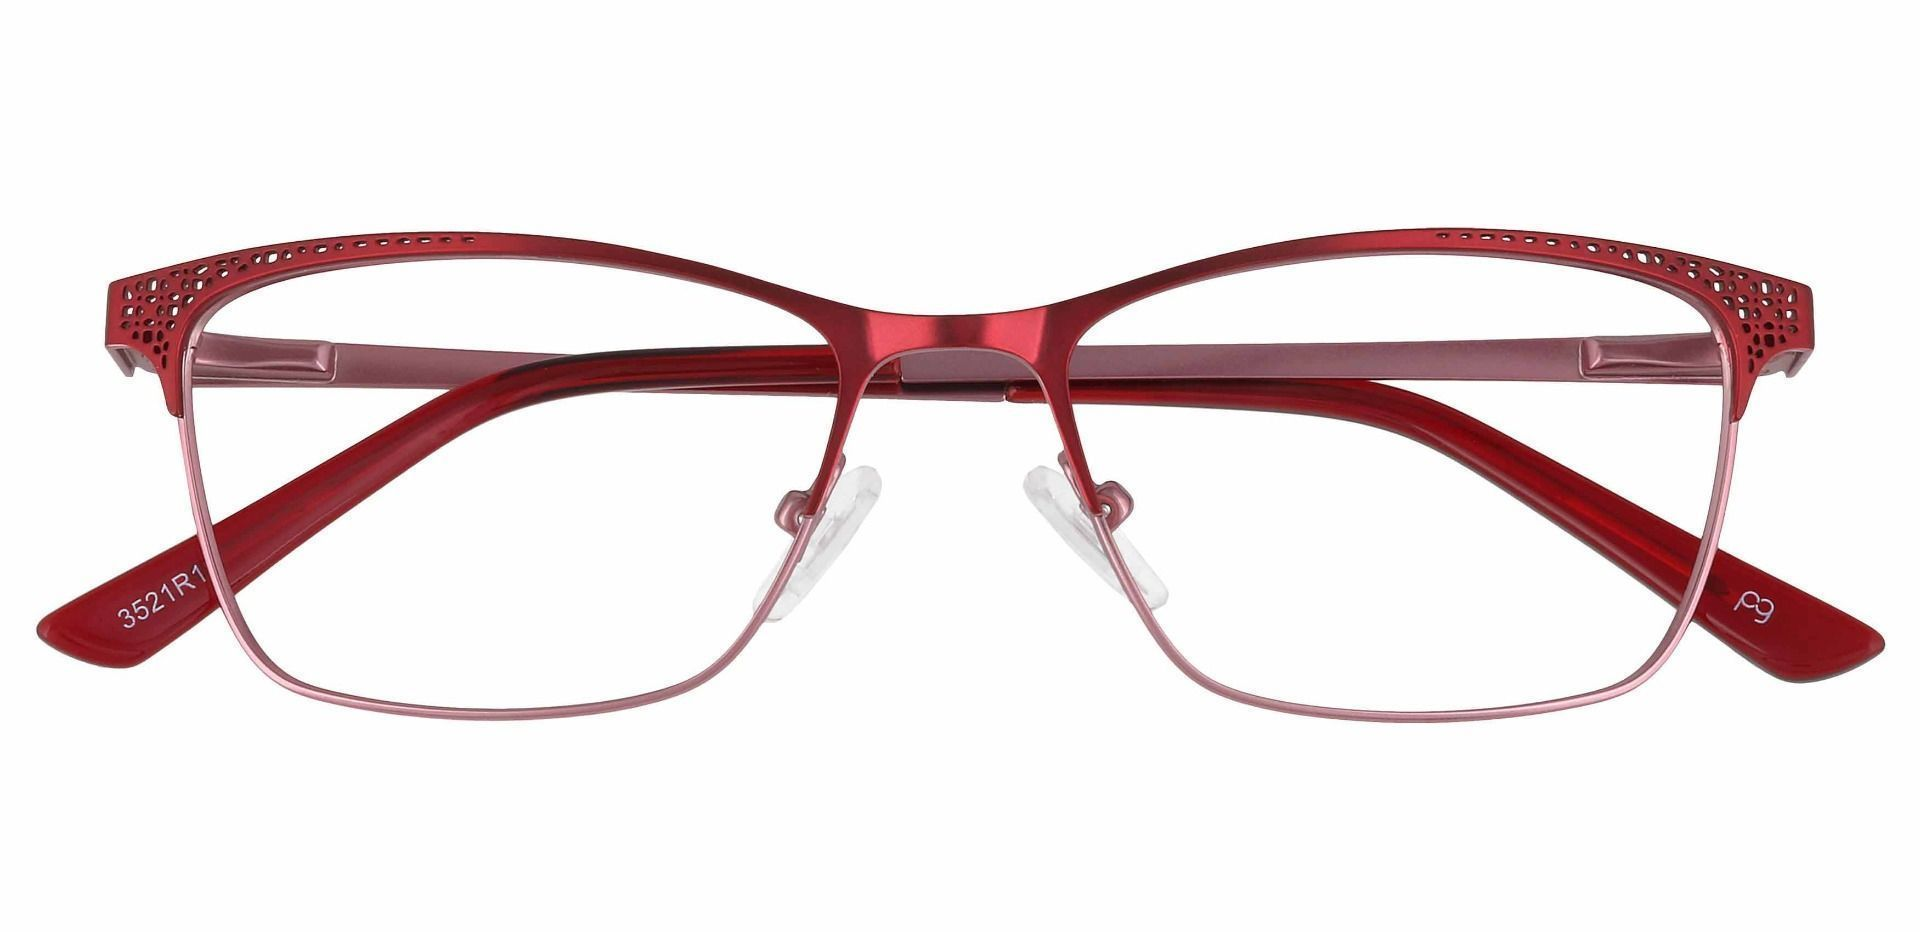 Paige Rectangle Prescription Glasses - Red